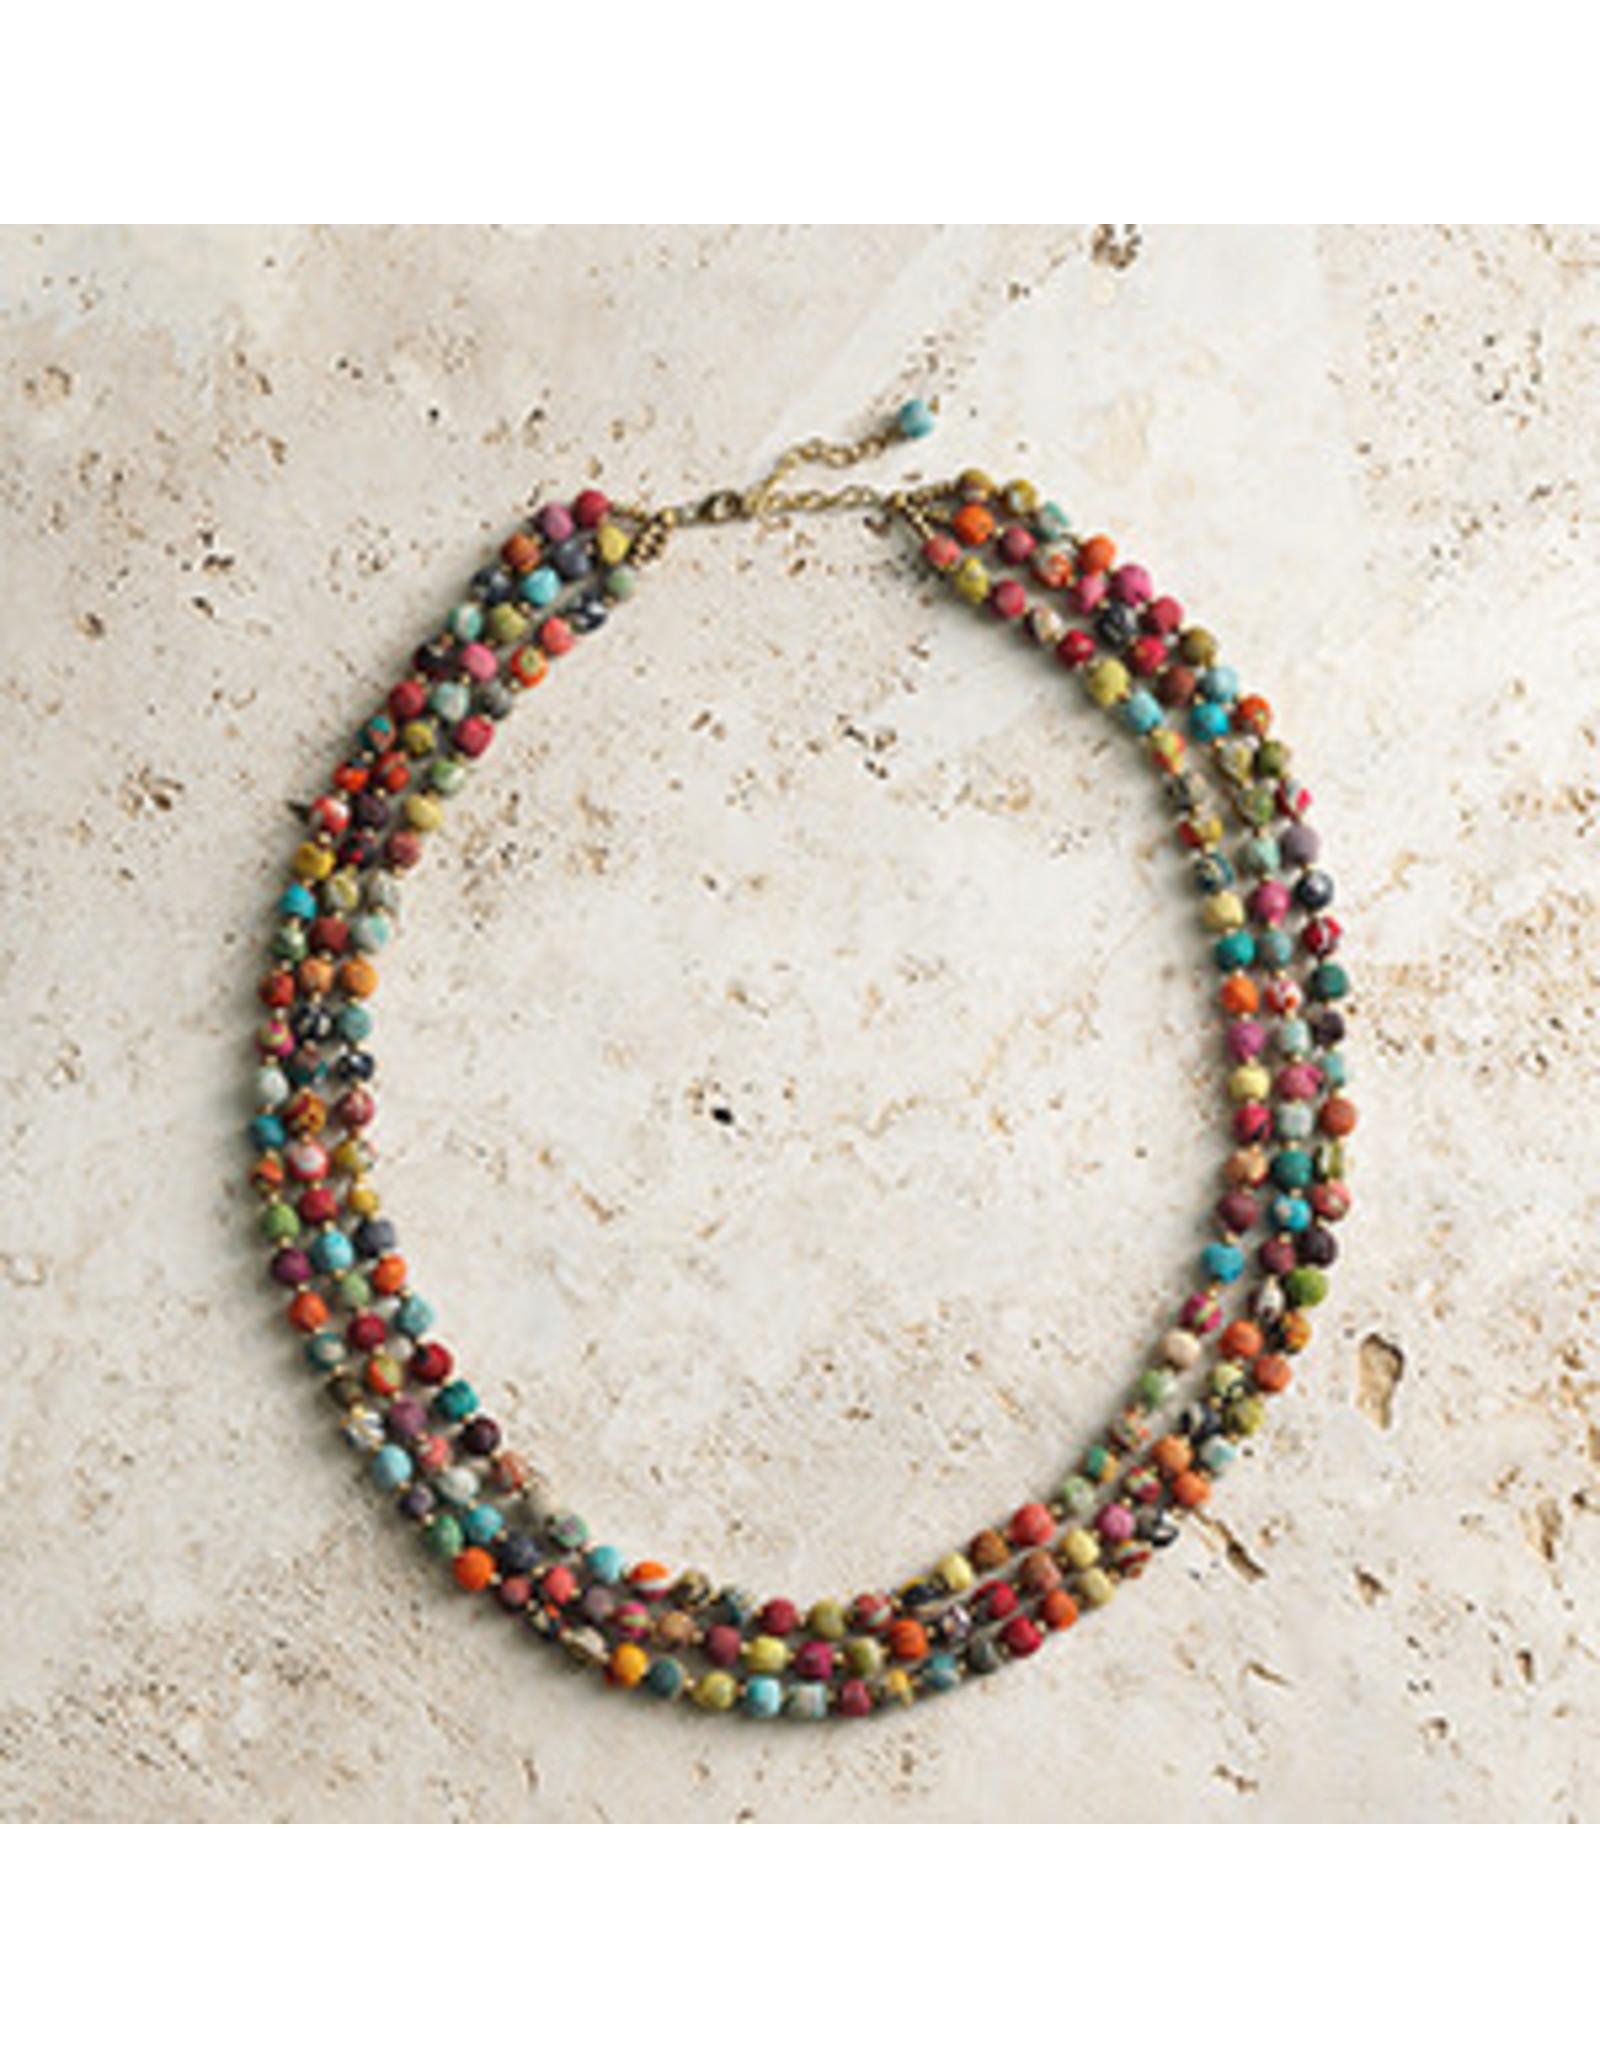 Triple Strand Sari Necklace